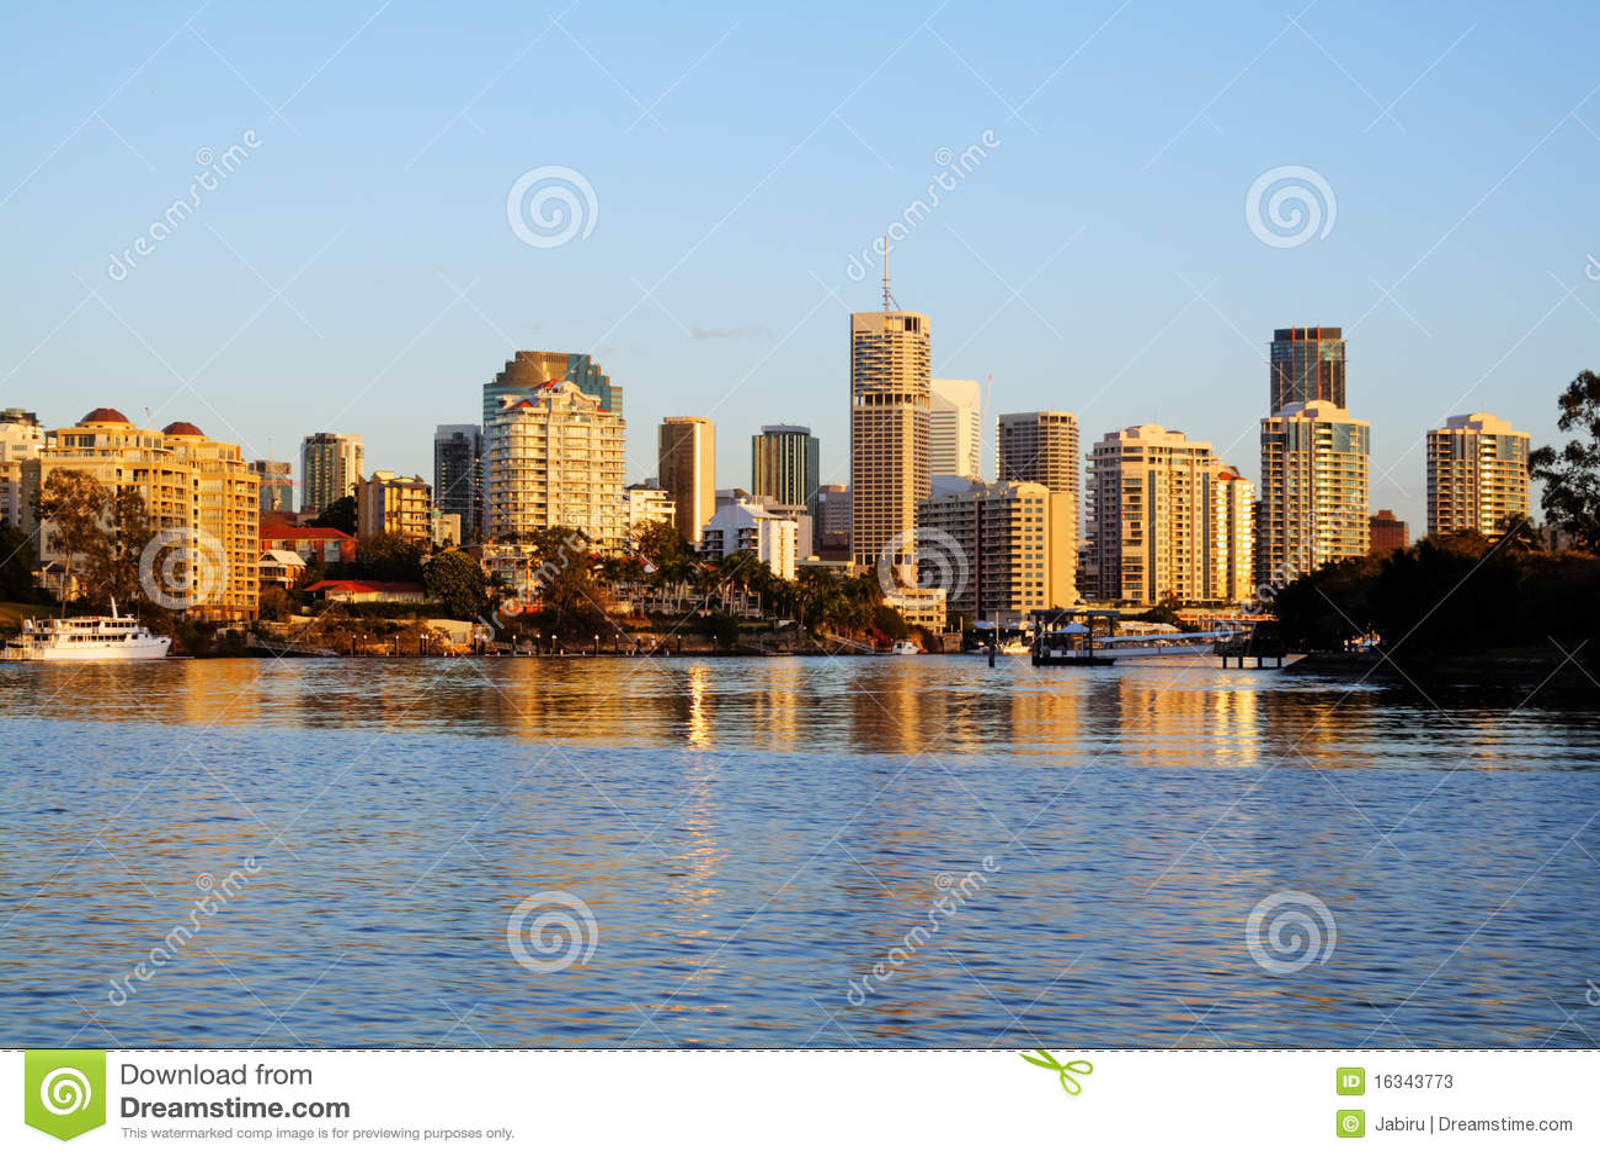 Brisbane City Skyline Australia Stock Image - Image of ...